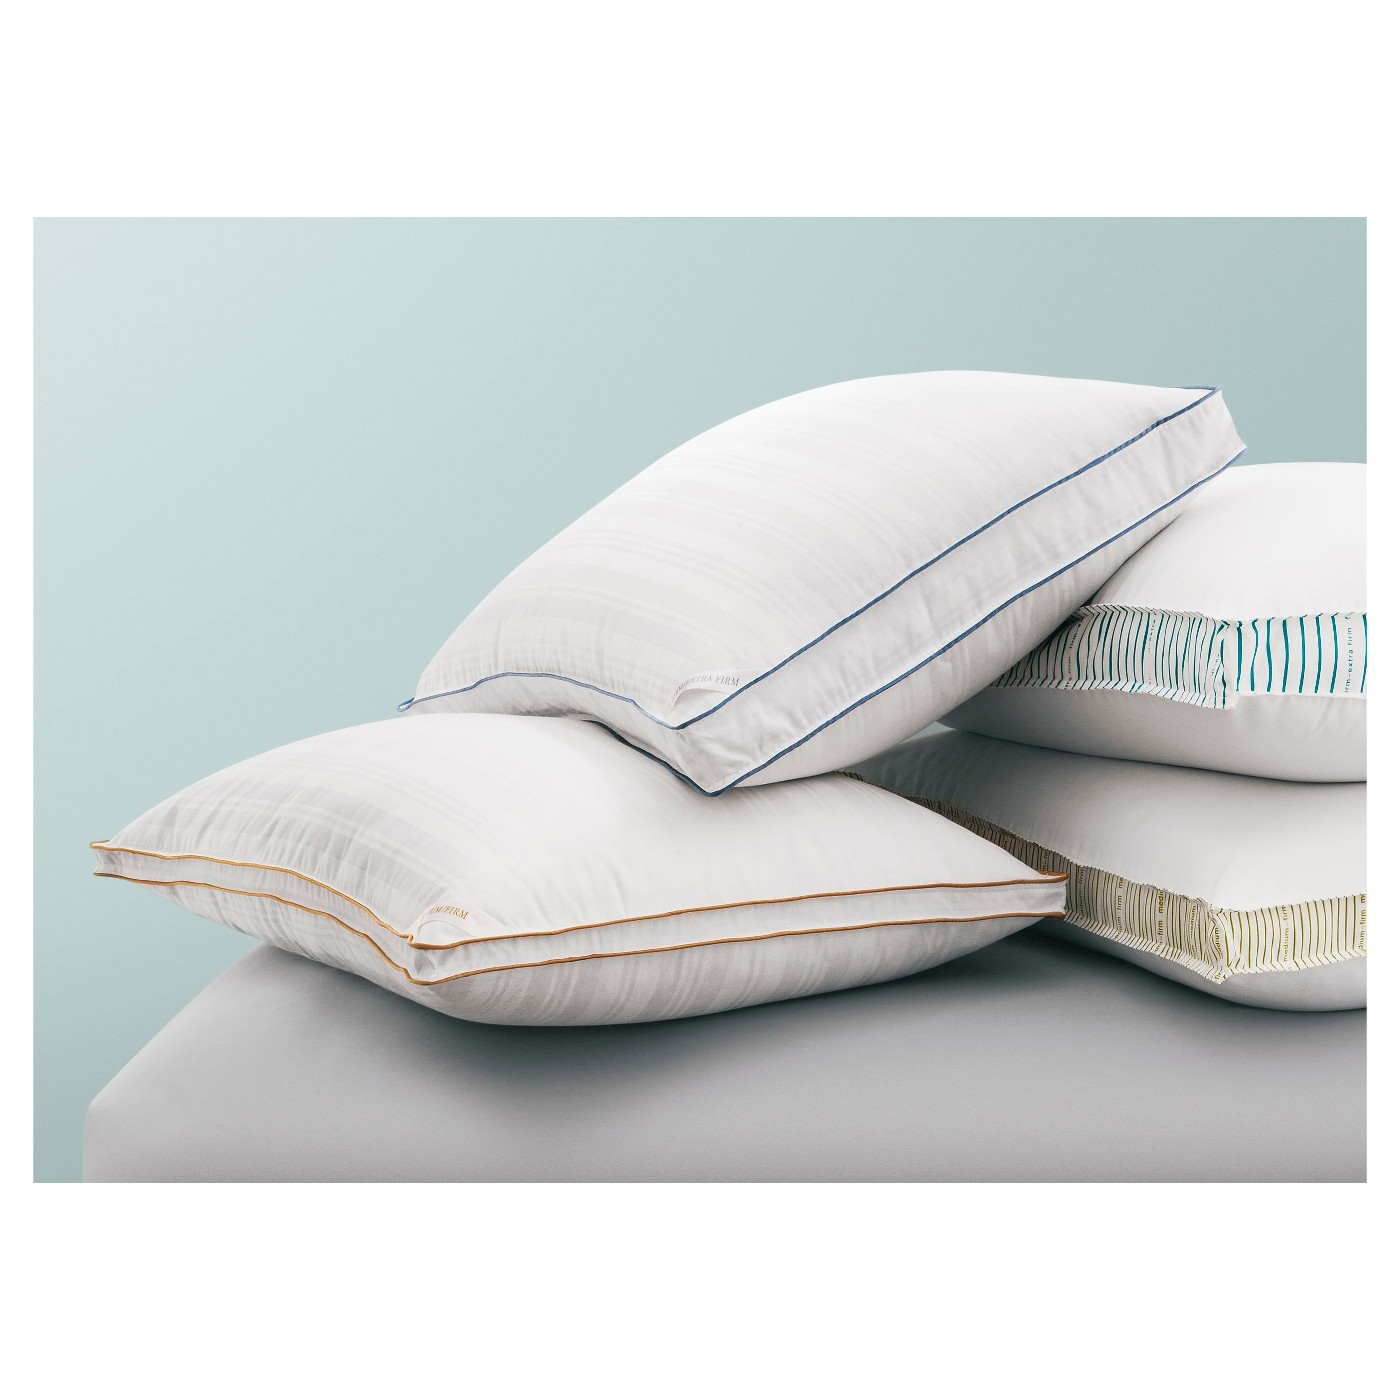 Down SurRound Medium/Firm Pillow - Fieldcrest® - image 2 of 2